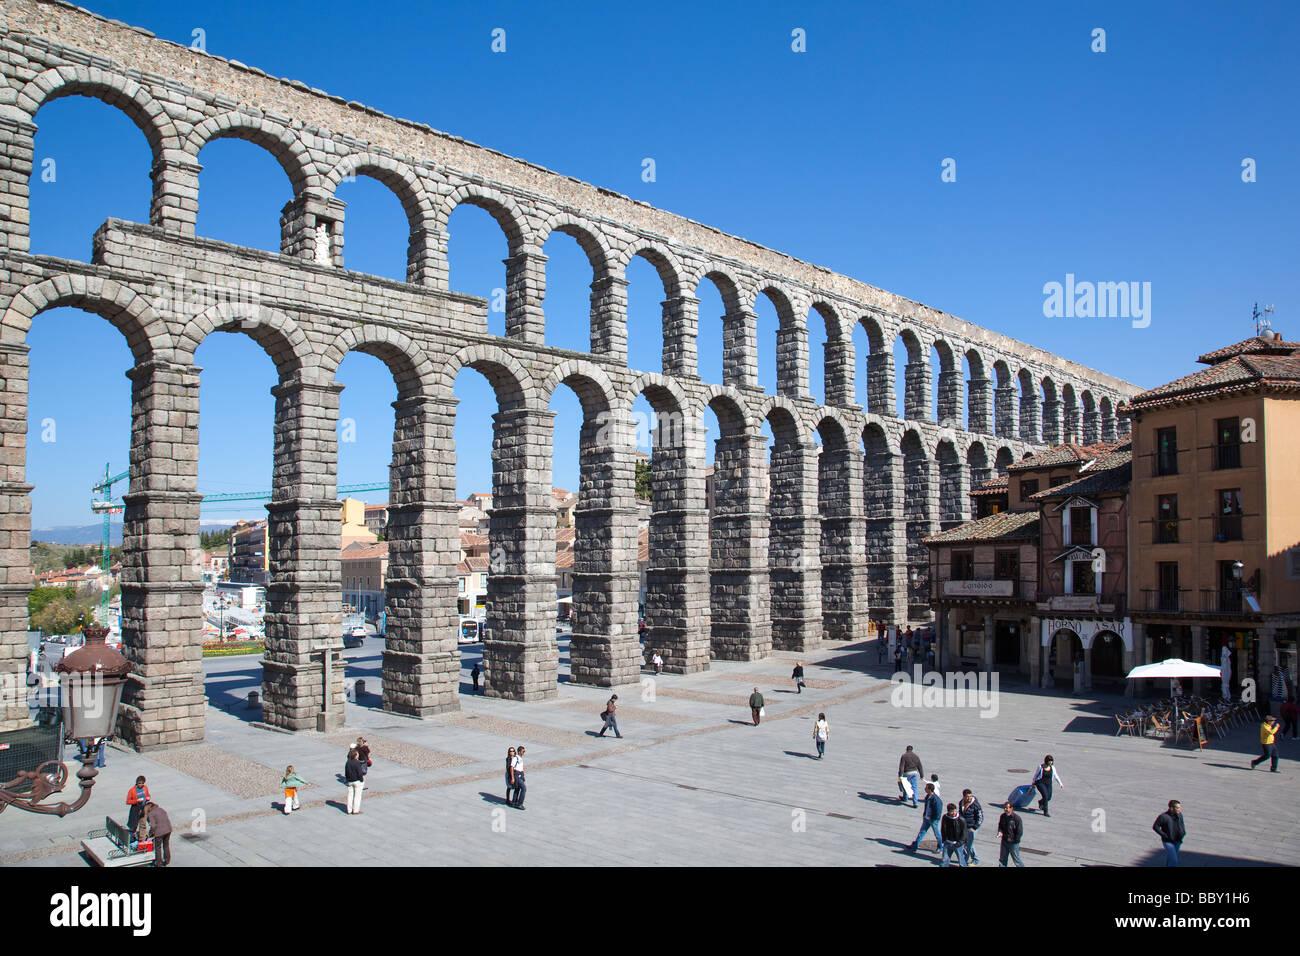 Aqueduct of Segovia, Roman aqueduct, Segovia, Spain - Stock Image